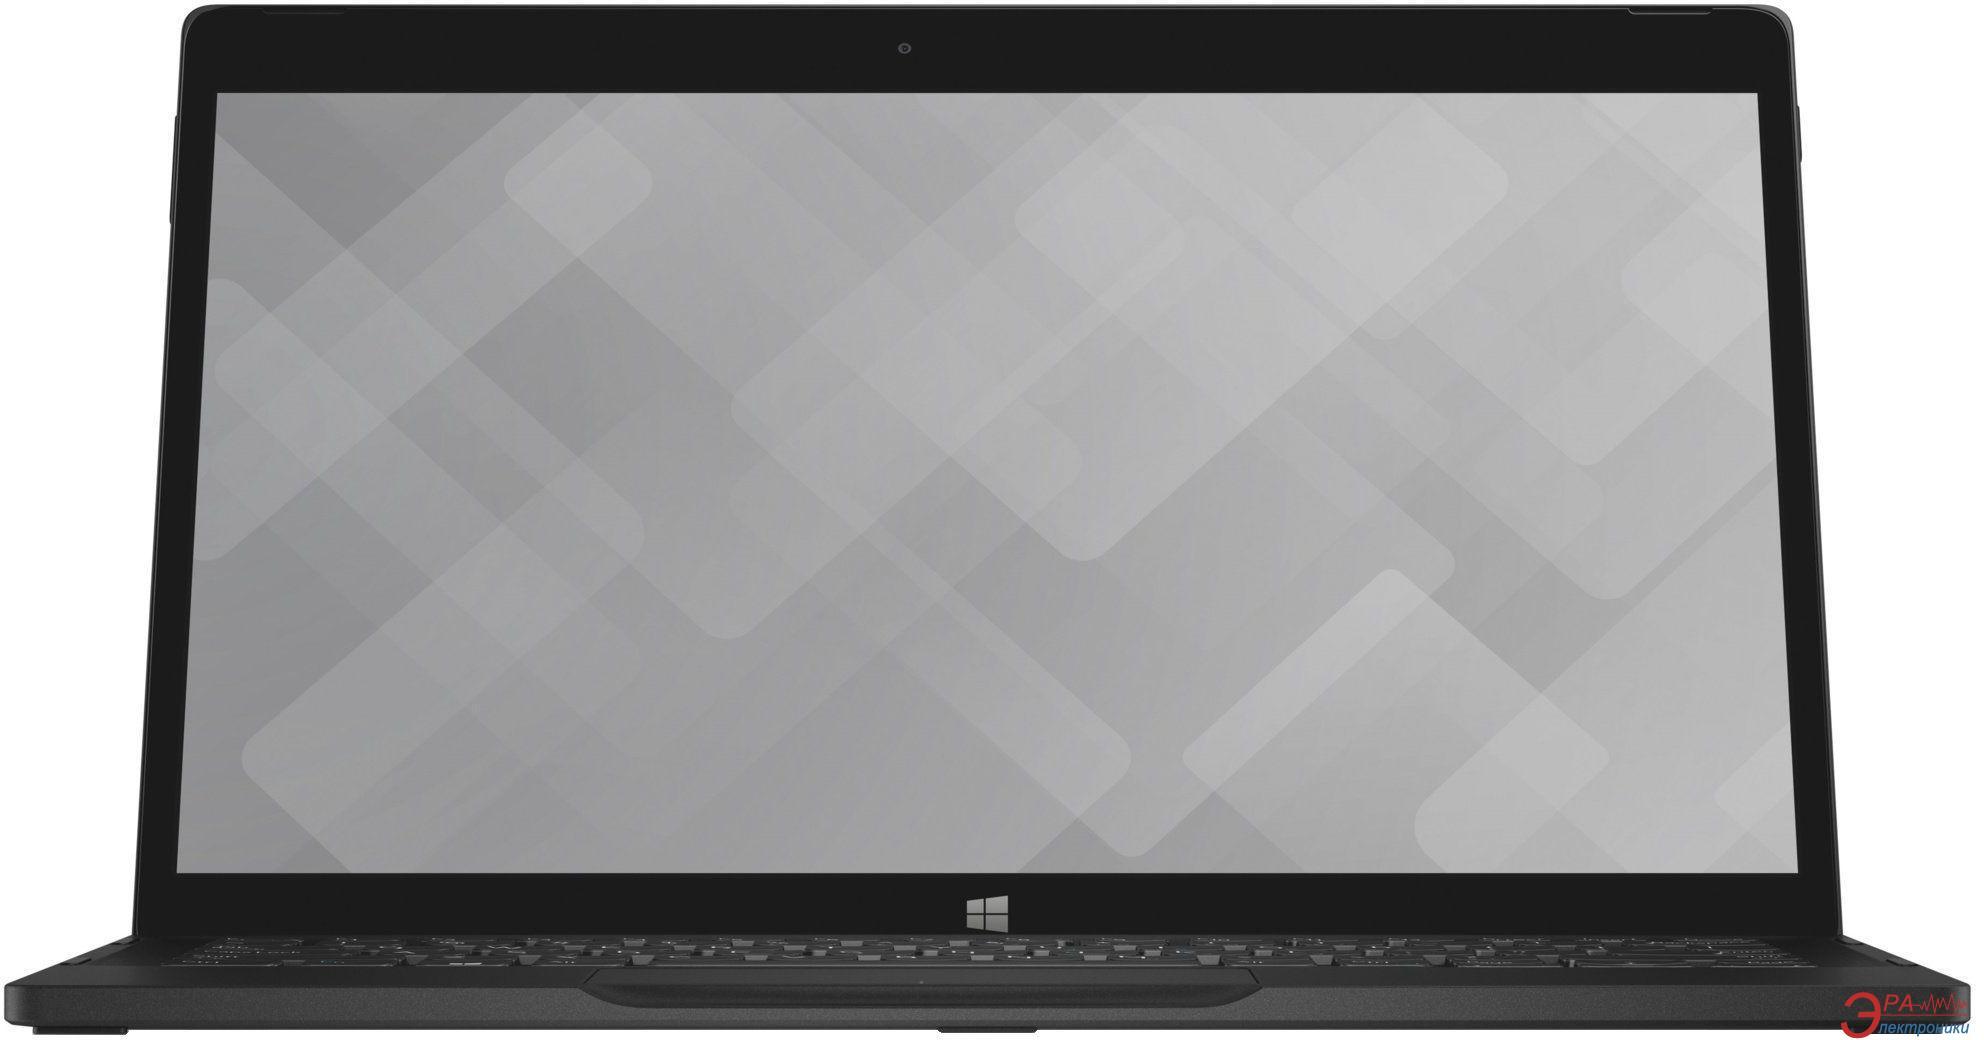 Ноутбук Dell Latitude E7275 (N005LE727512EMEA) Black 12,5